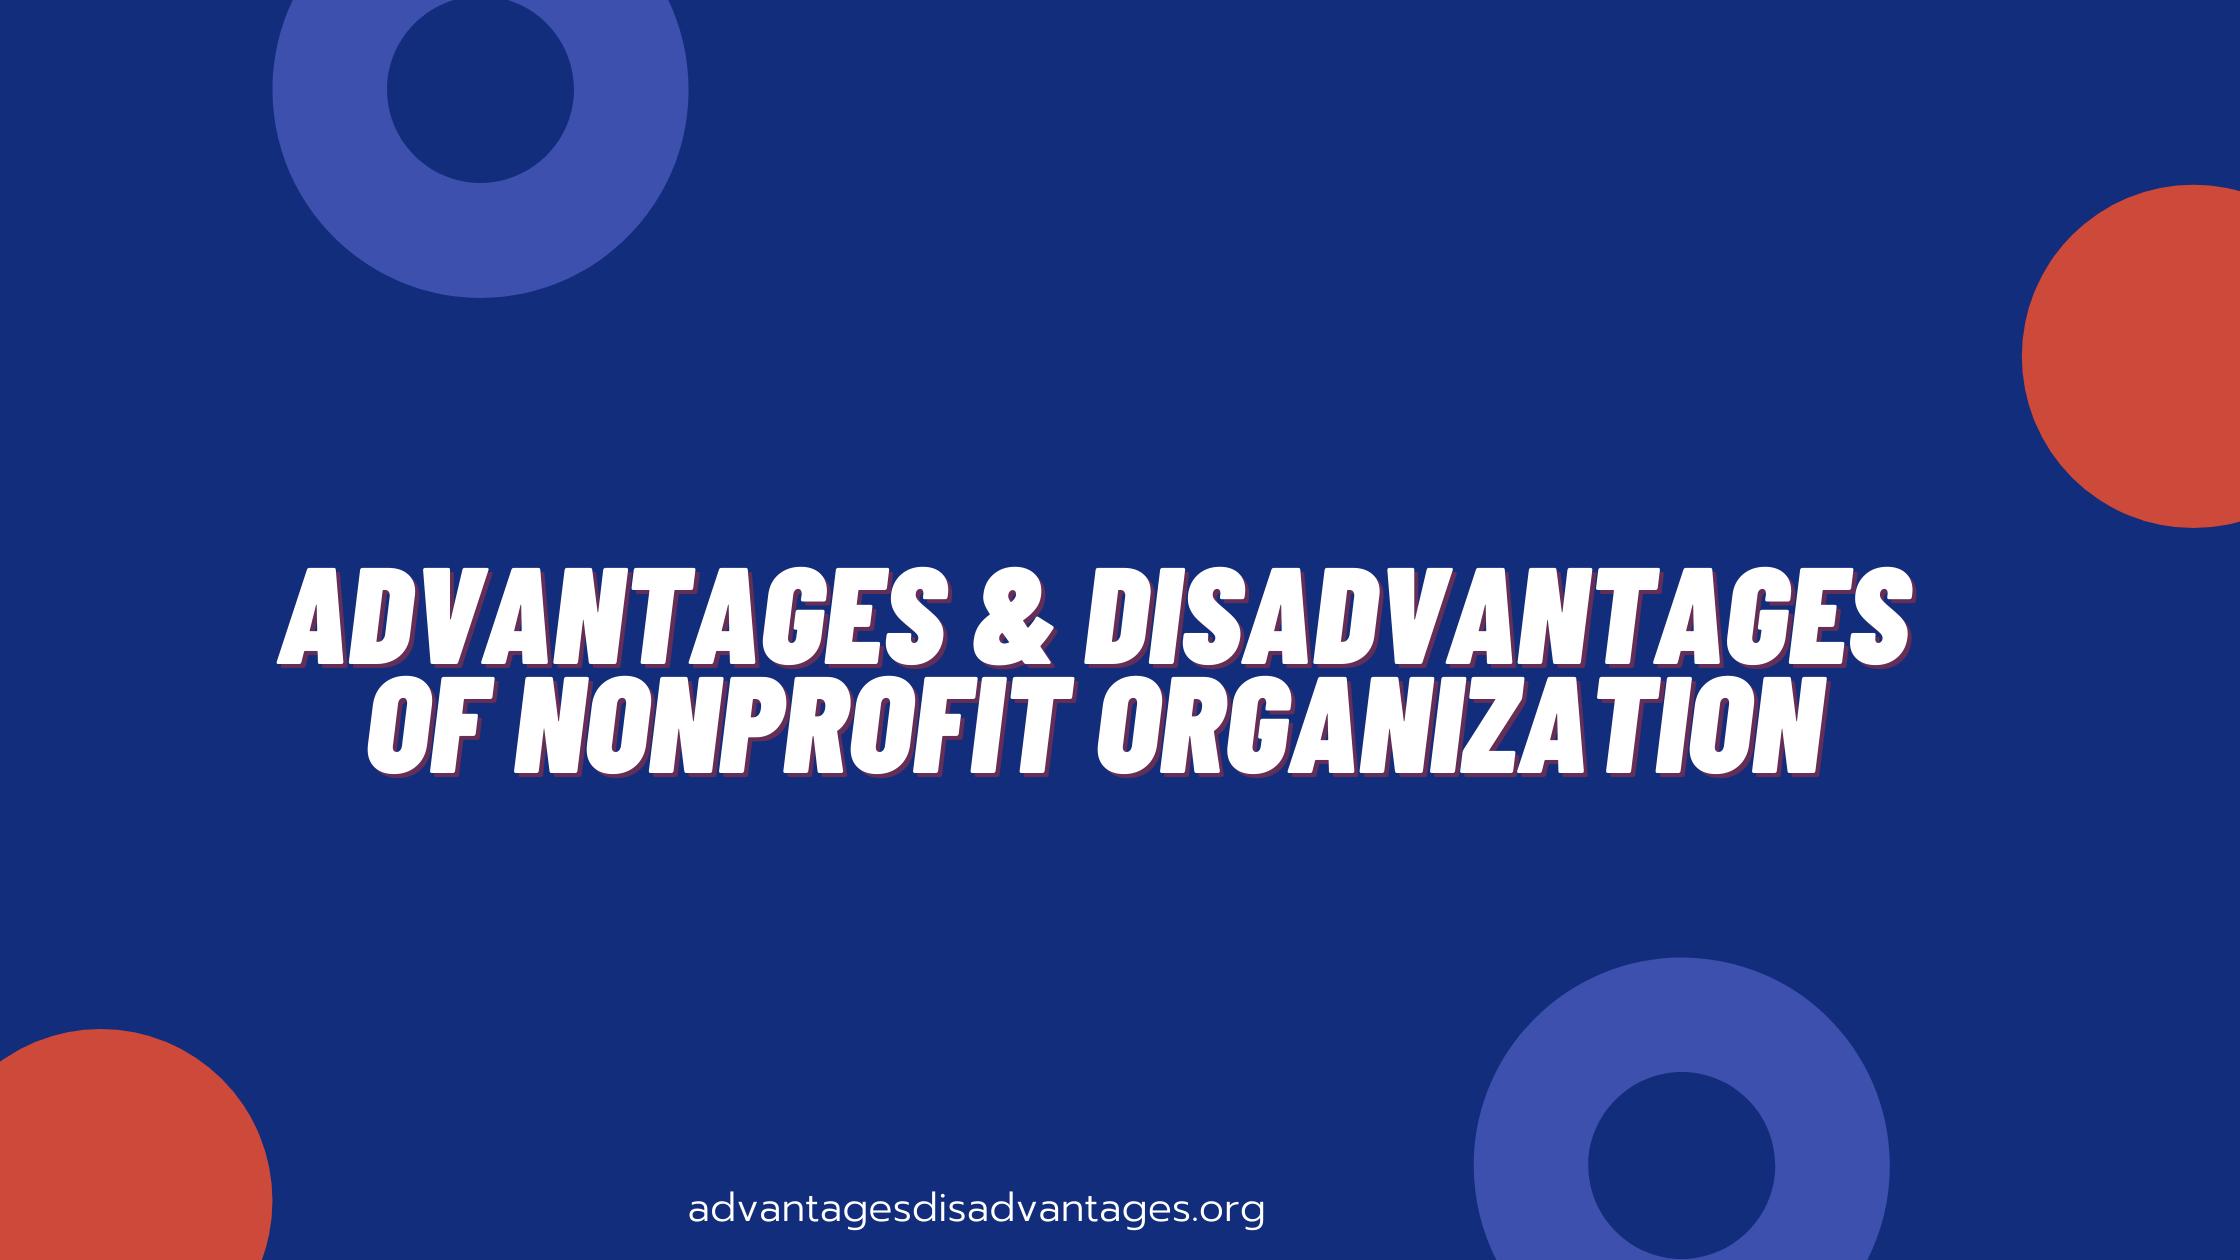 Advantages and Disadvantages of Nonprofit Organization